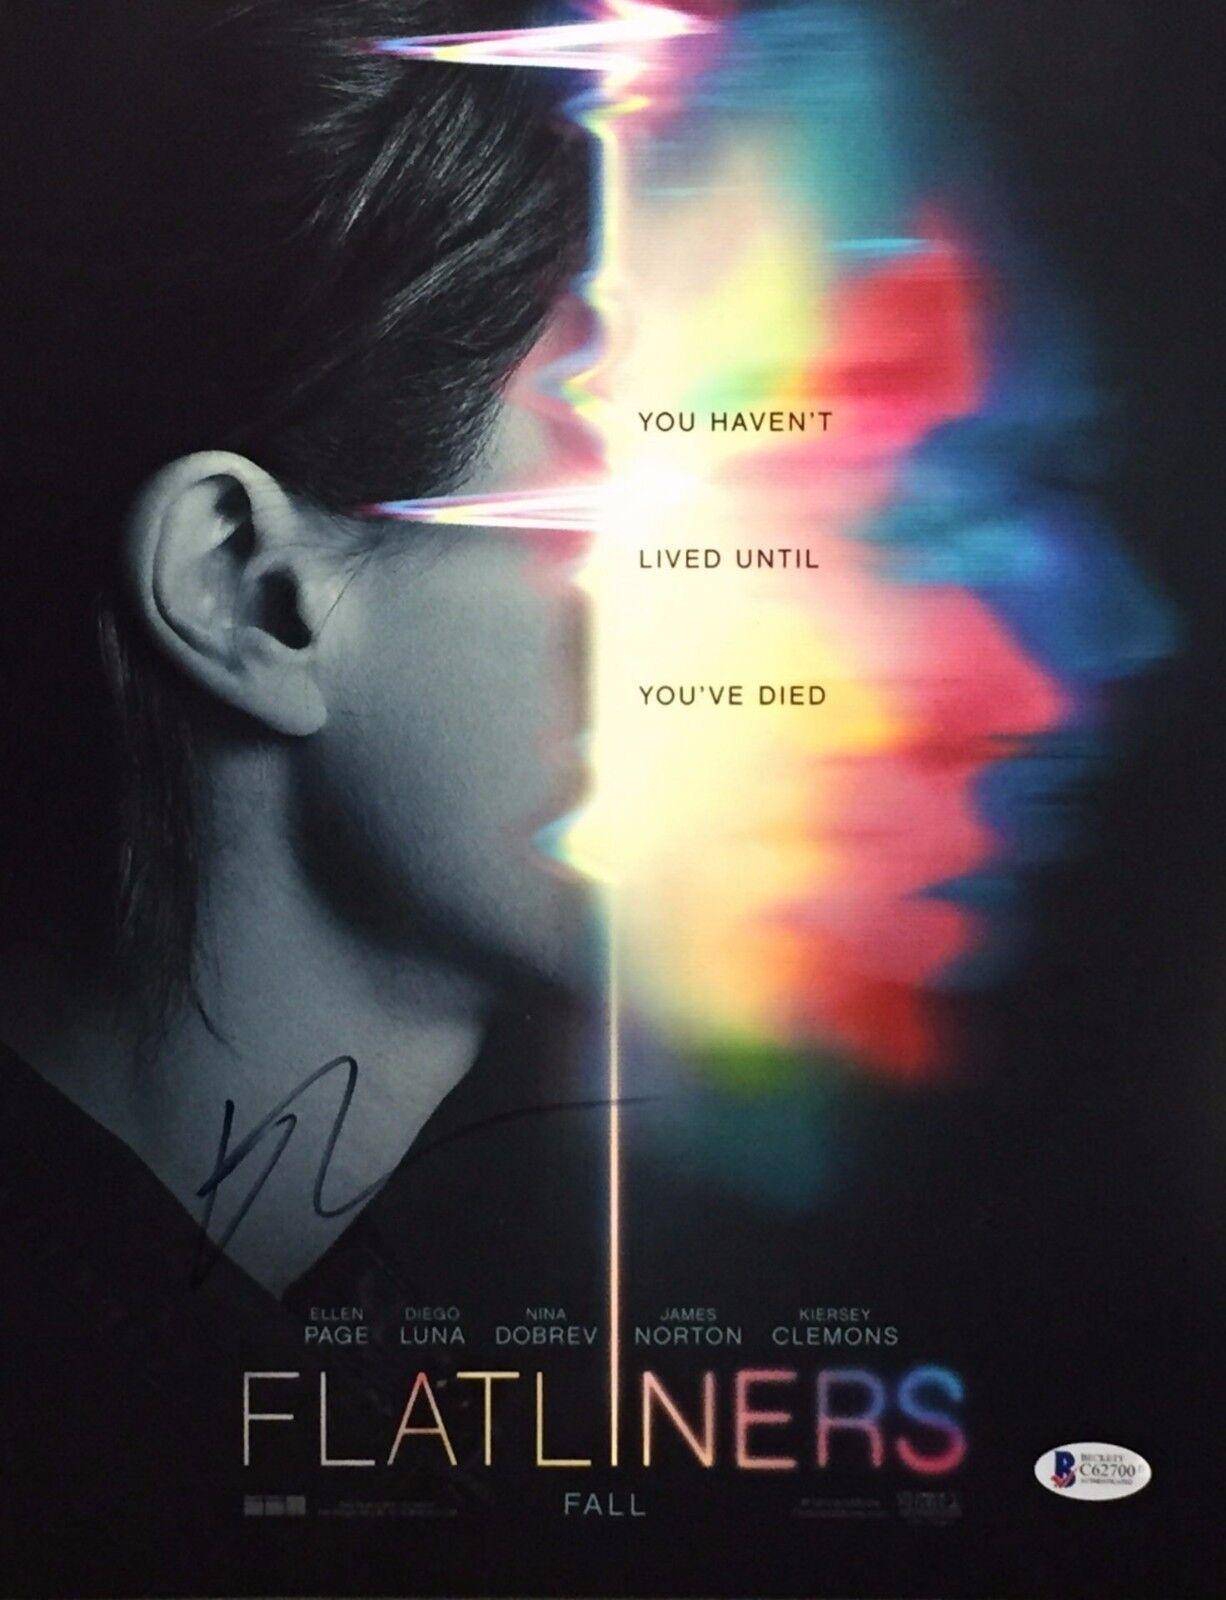 Ellen Page Signed 'Flatliners' 11x14 Photo Beckett C62700